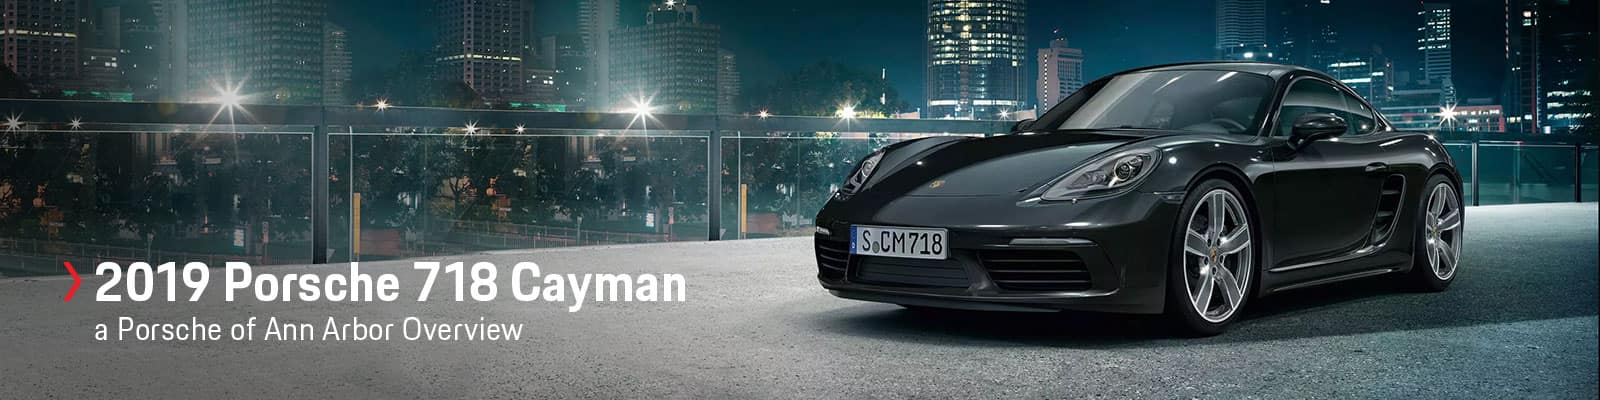 2019 Porsche 718 Cayman Model Review with Prices, Photos, & Specs at Porsche of Ann Arbor